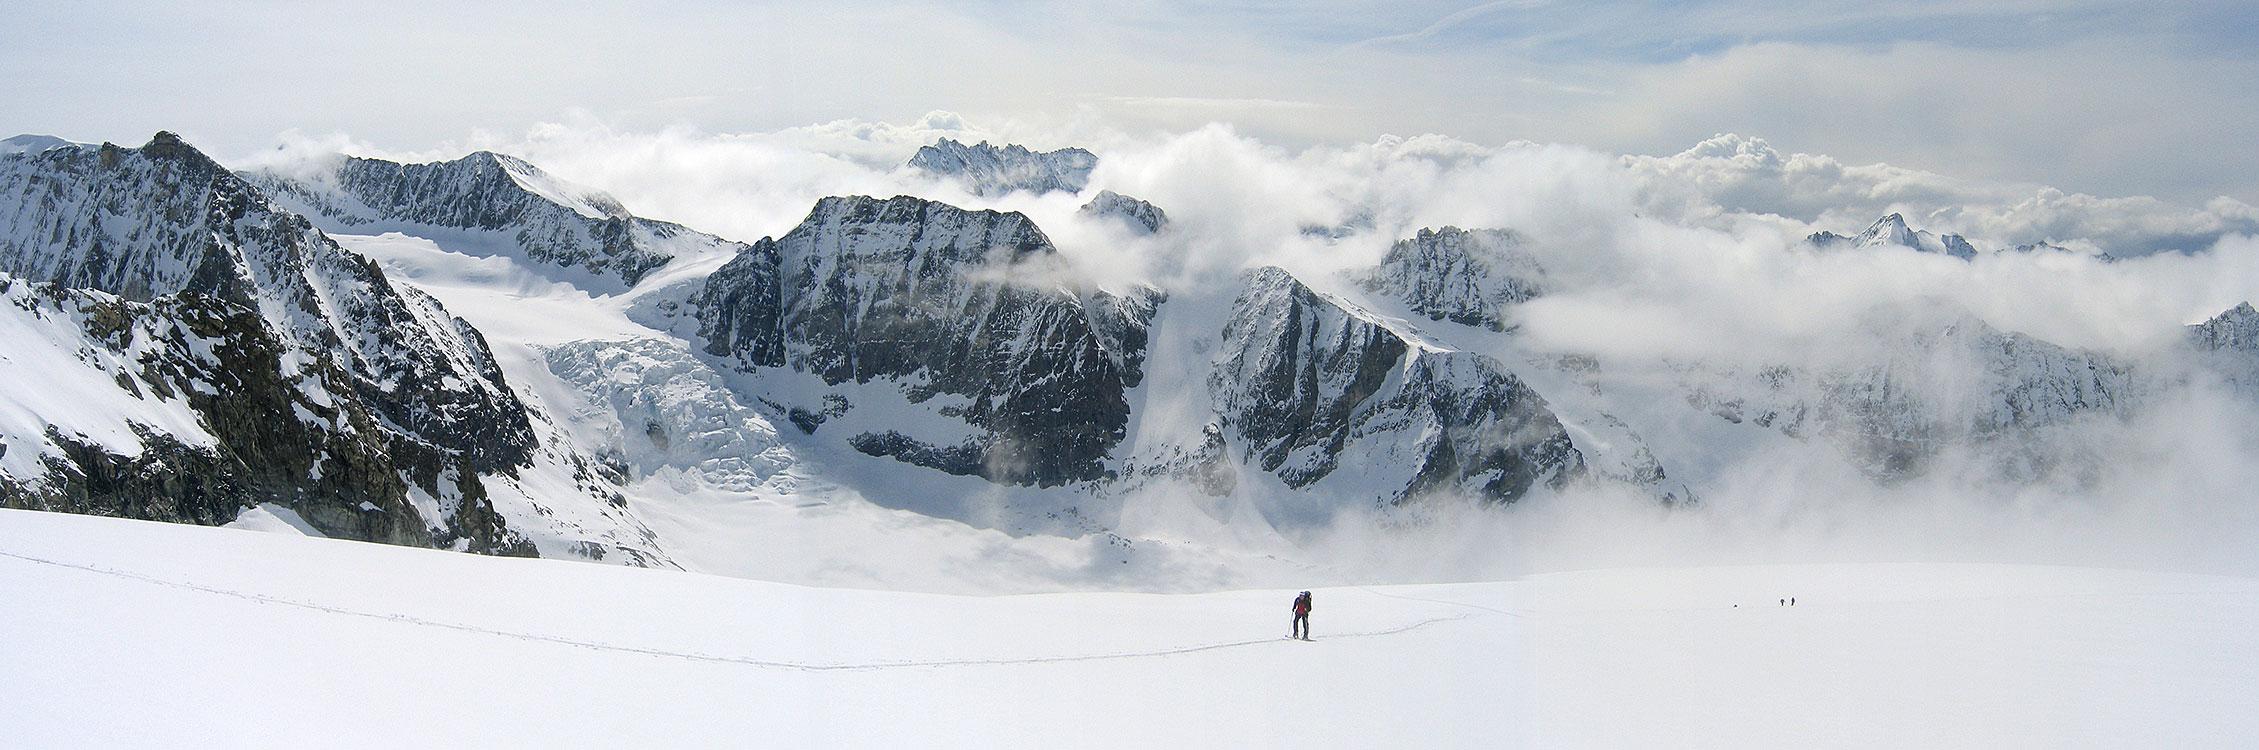 La Ruinette Walliser Alpen / Alpes valaisannes Švýcarsko panorama 37